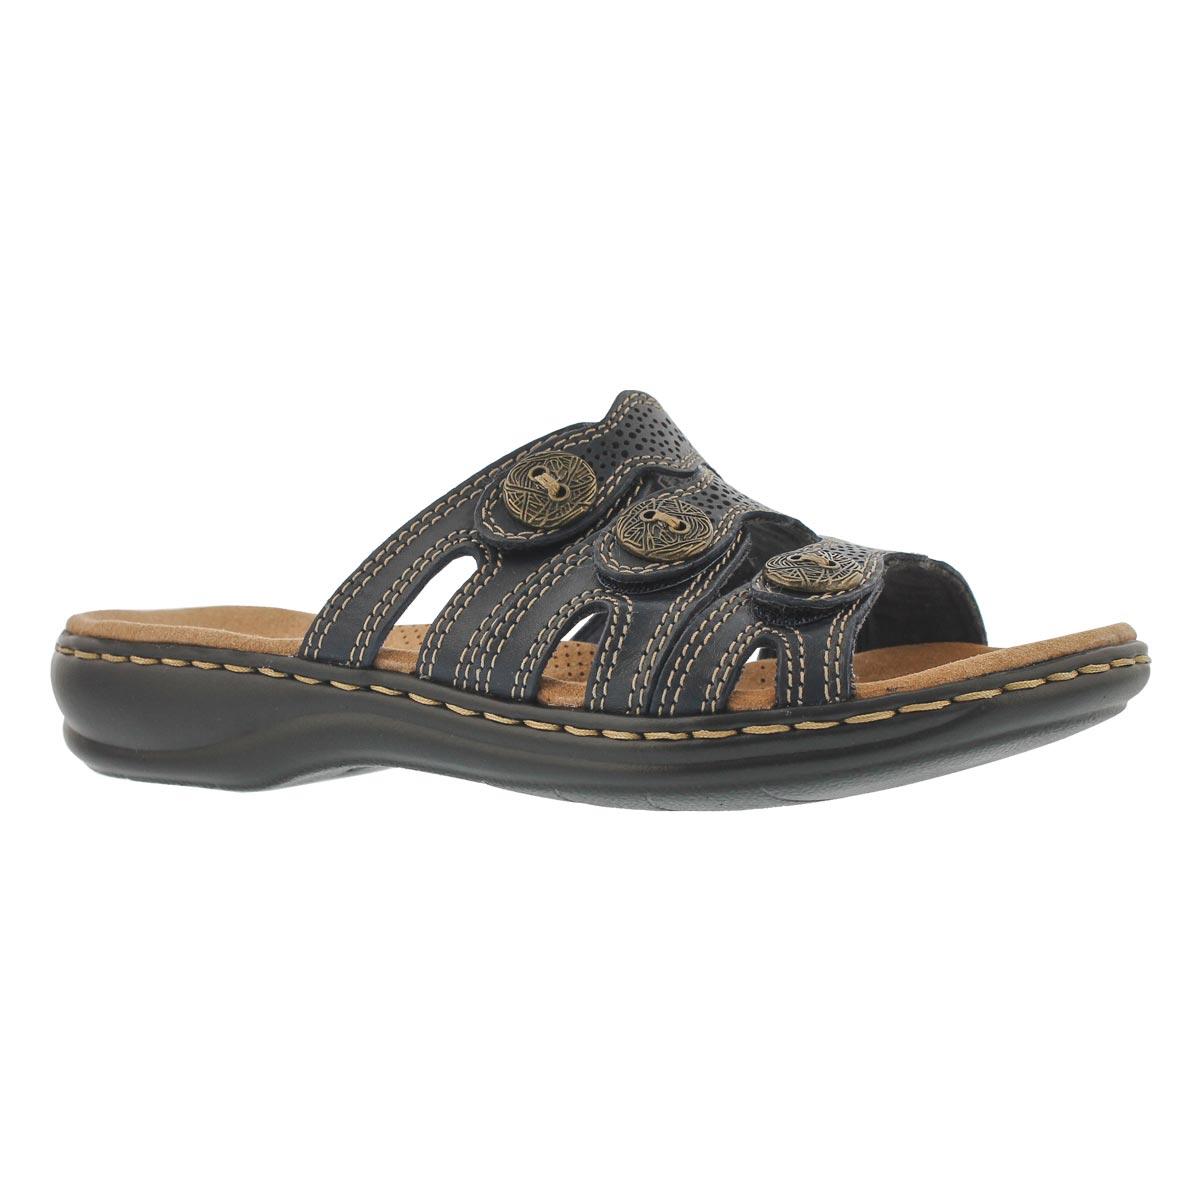 Women's LEISA GRACE navy casual slide sandals